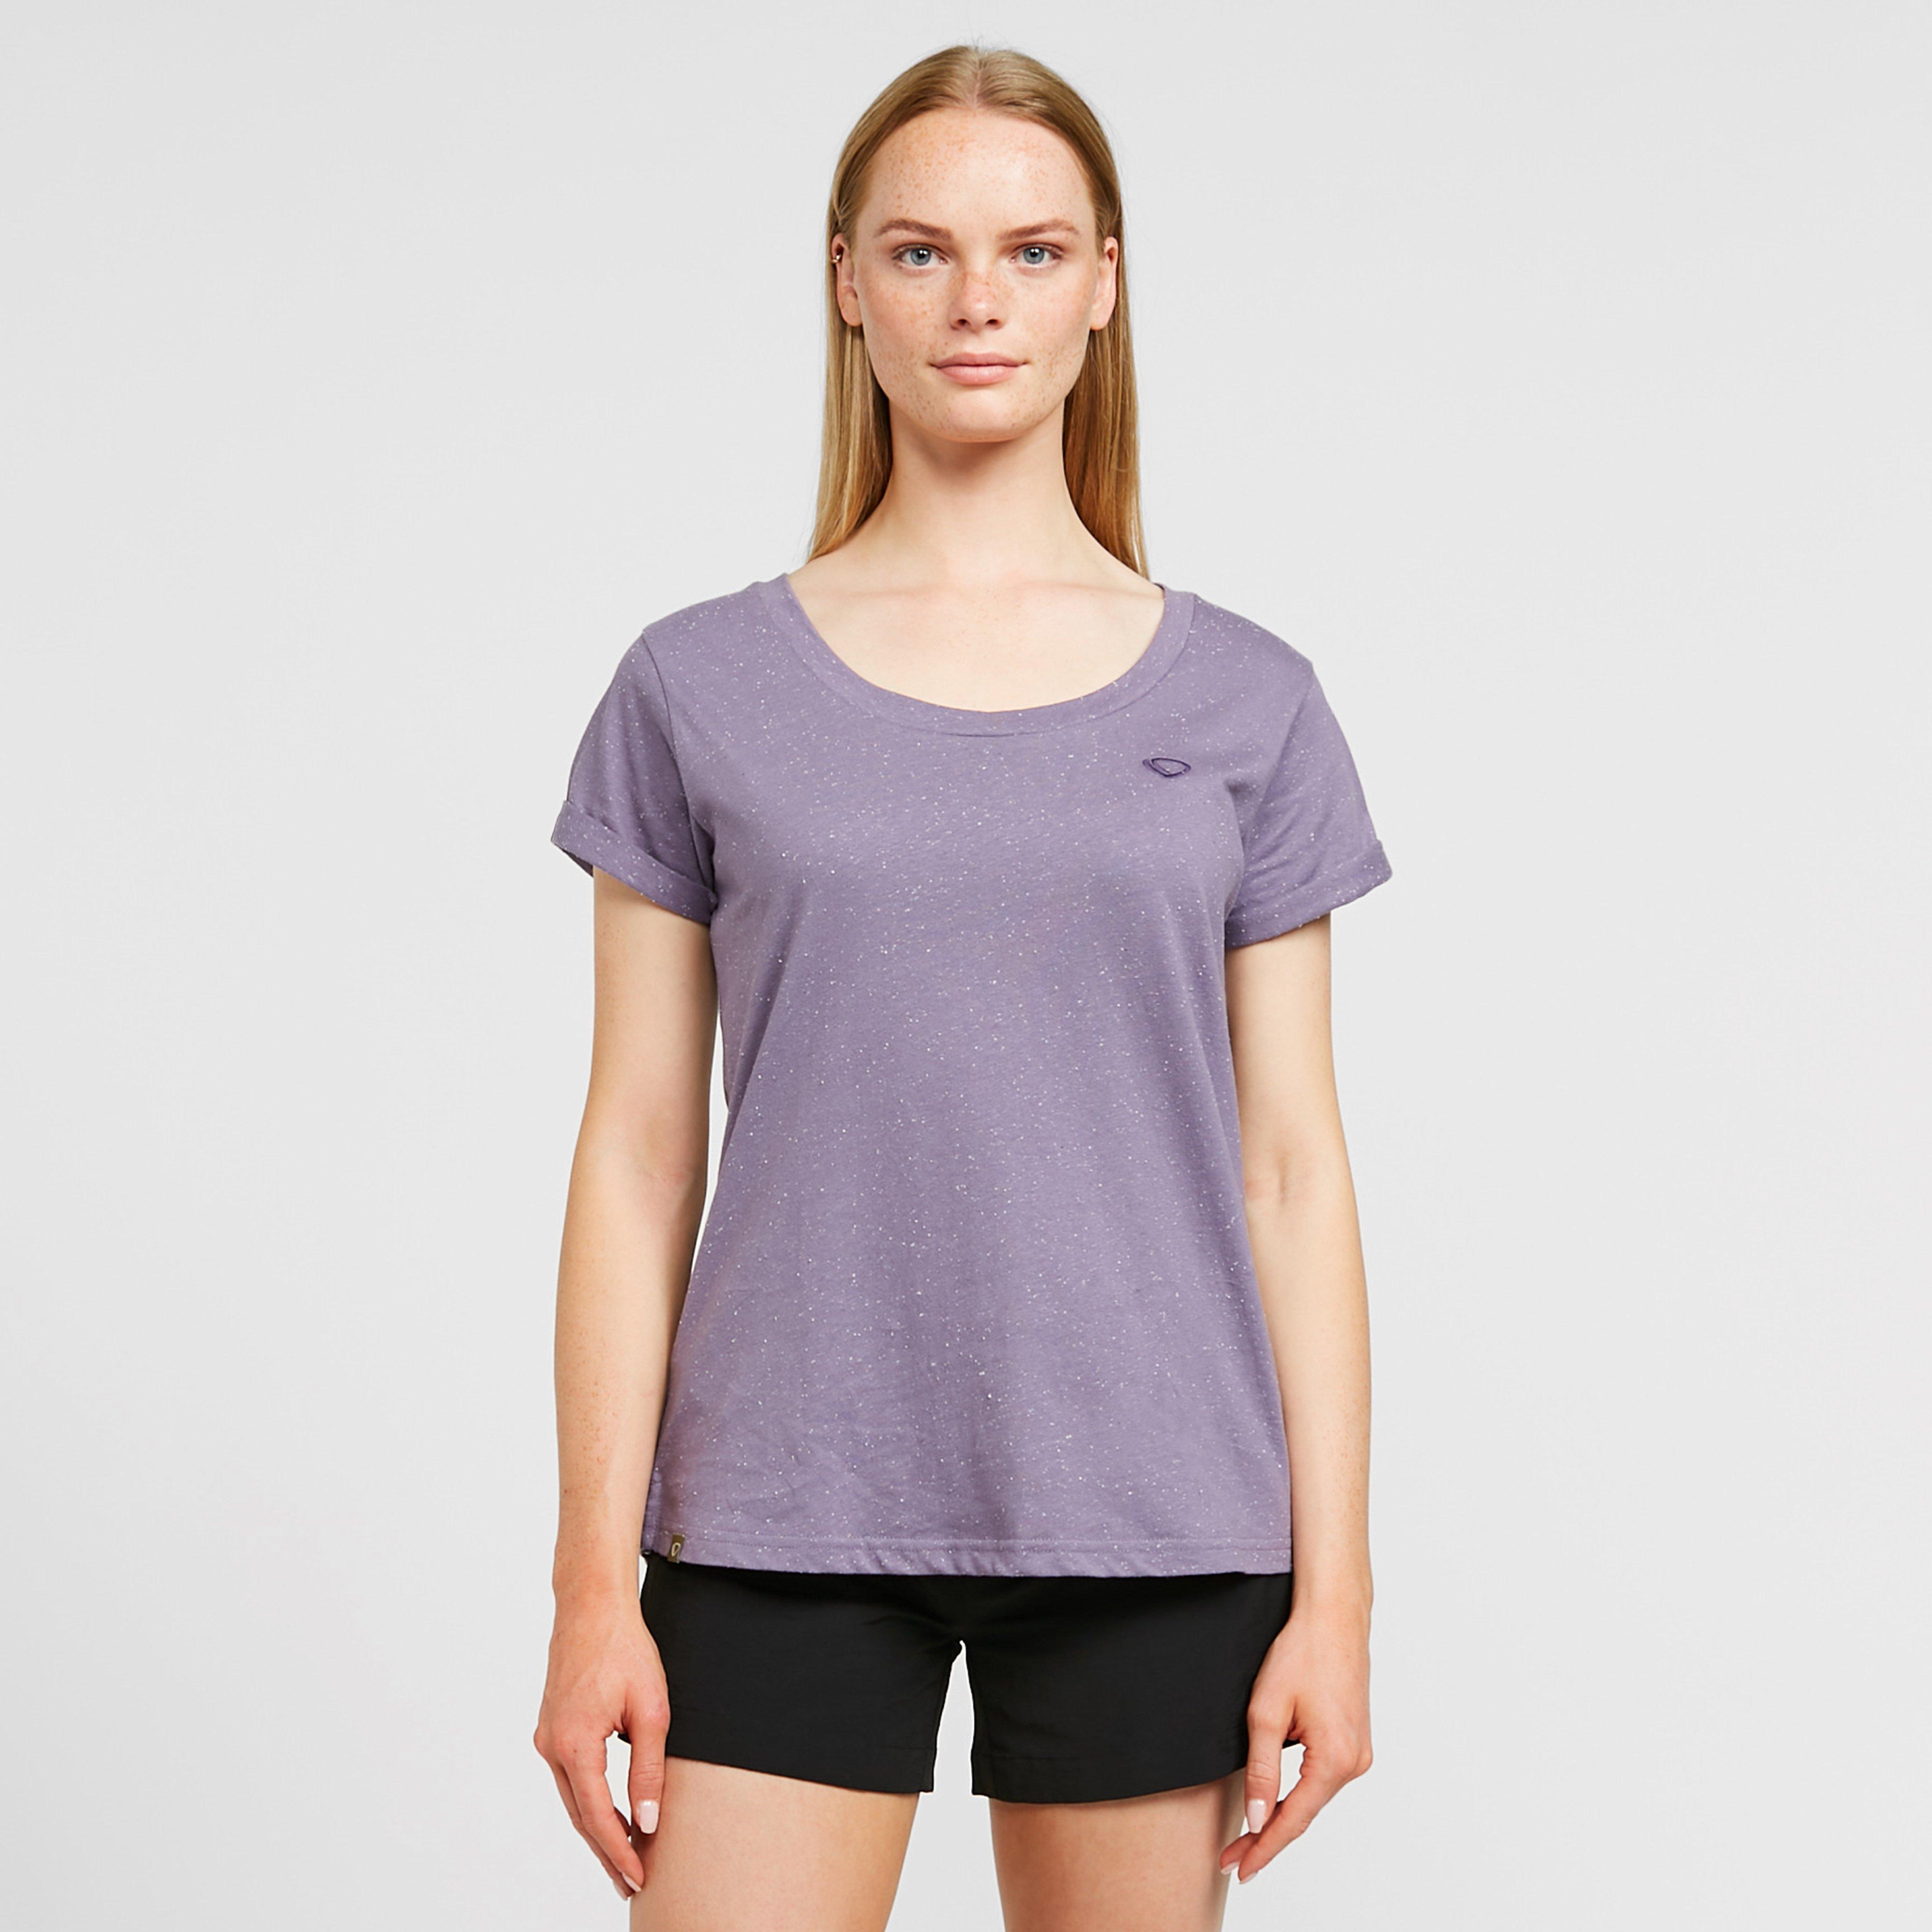 Brasher Brasher Womens Neppy T-Shirt, Purple